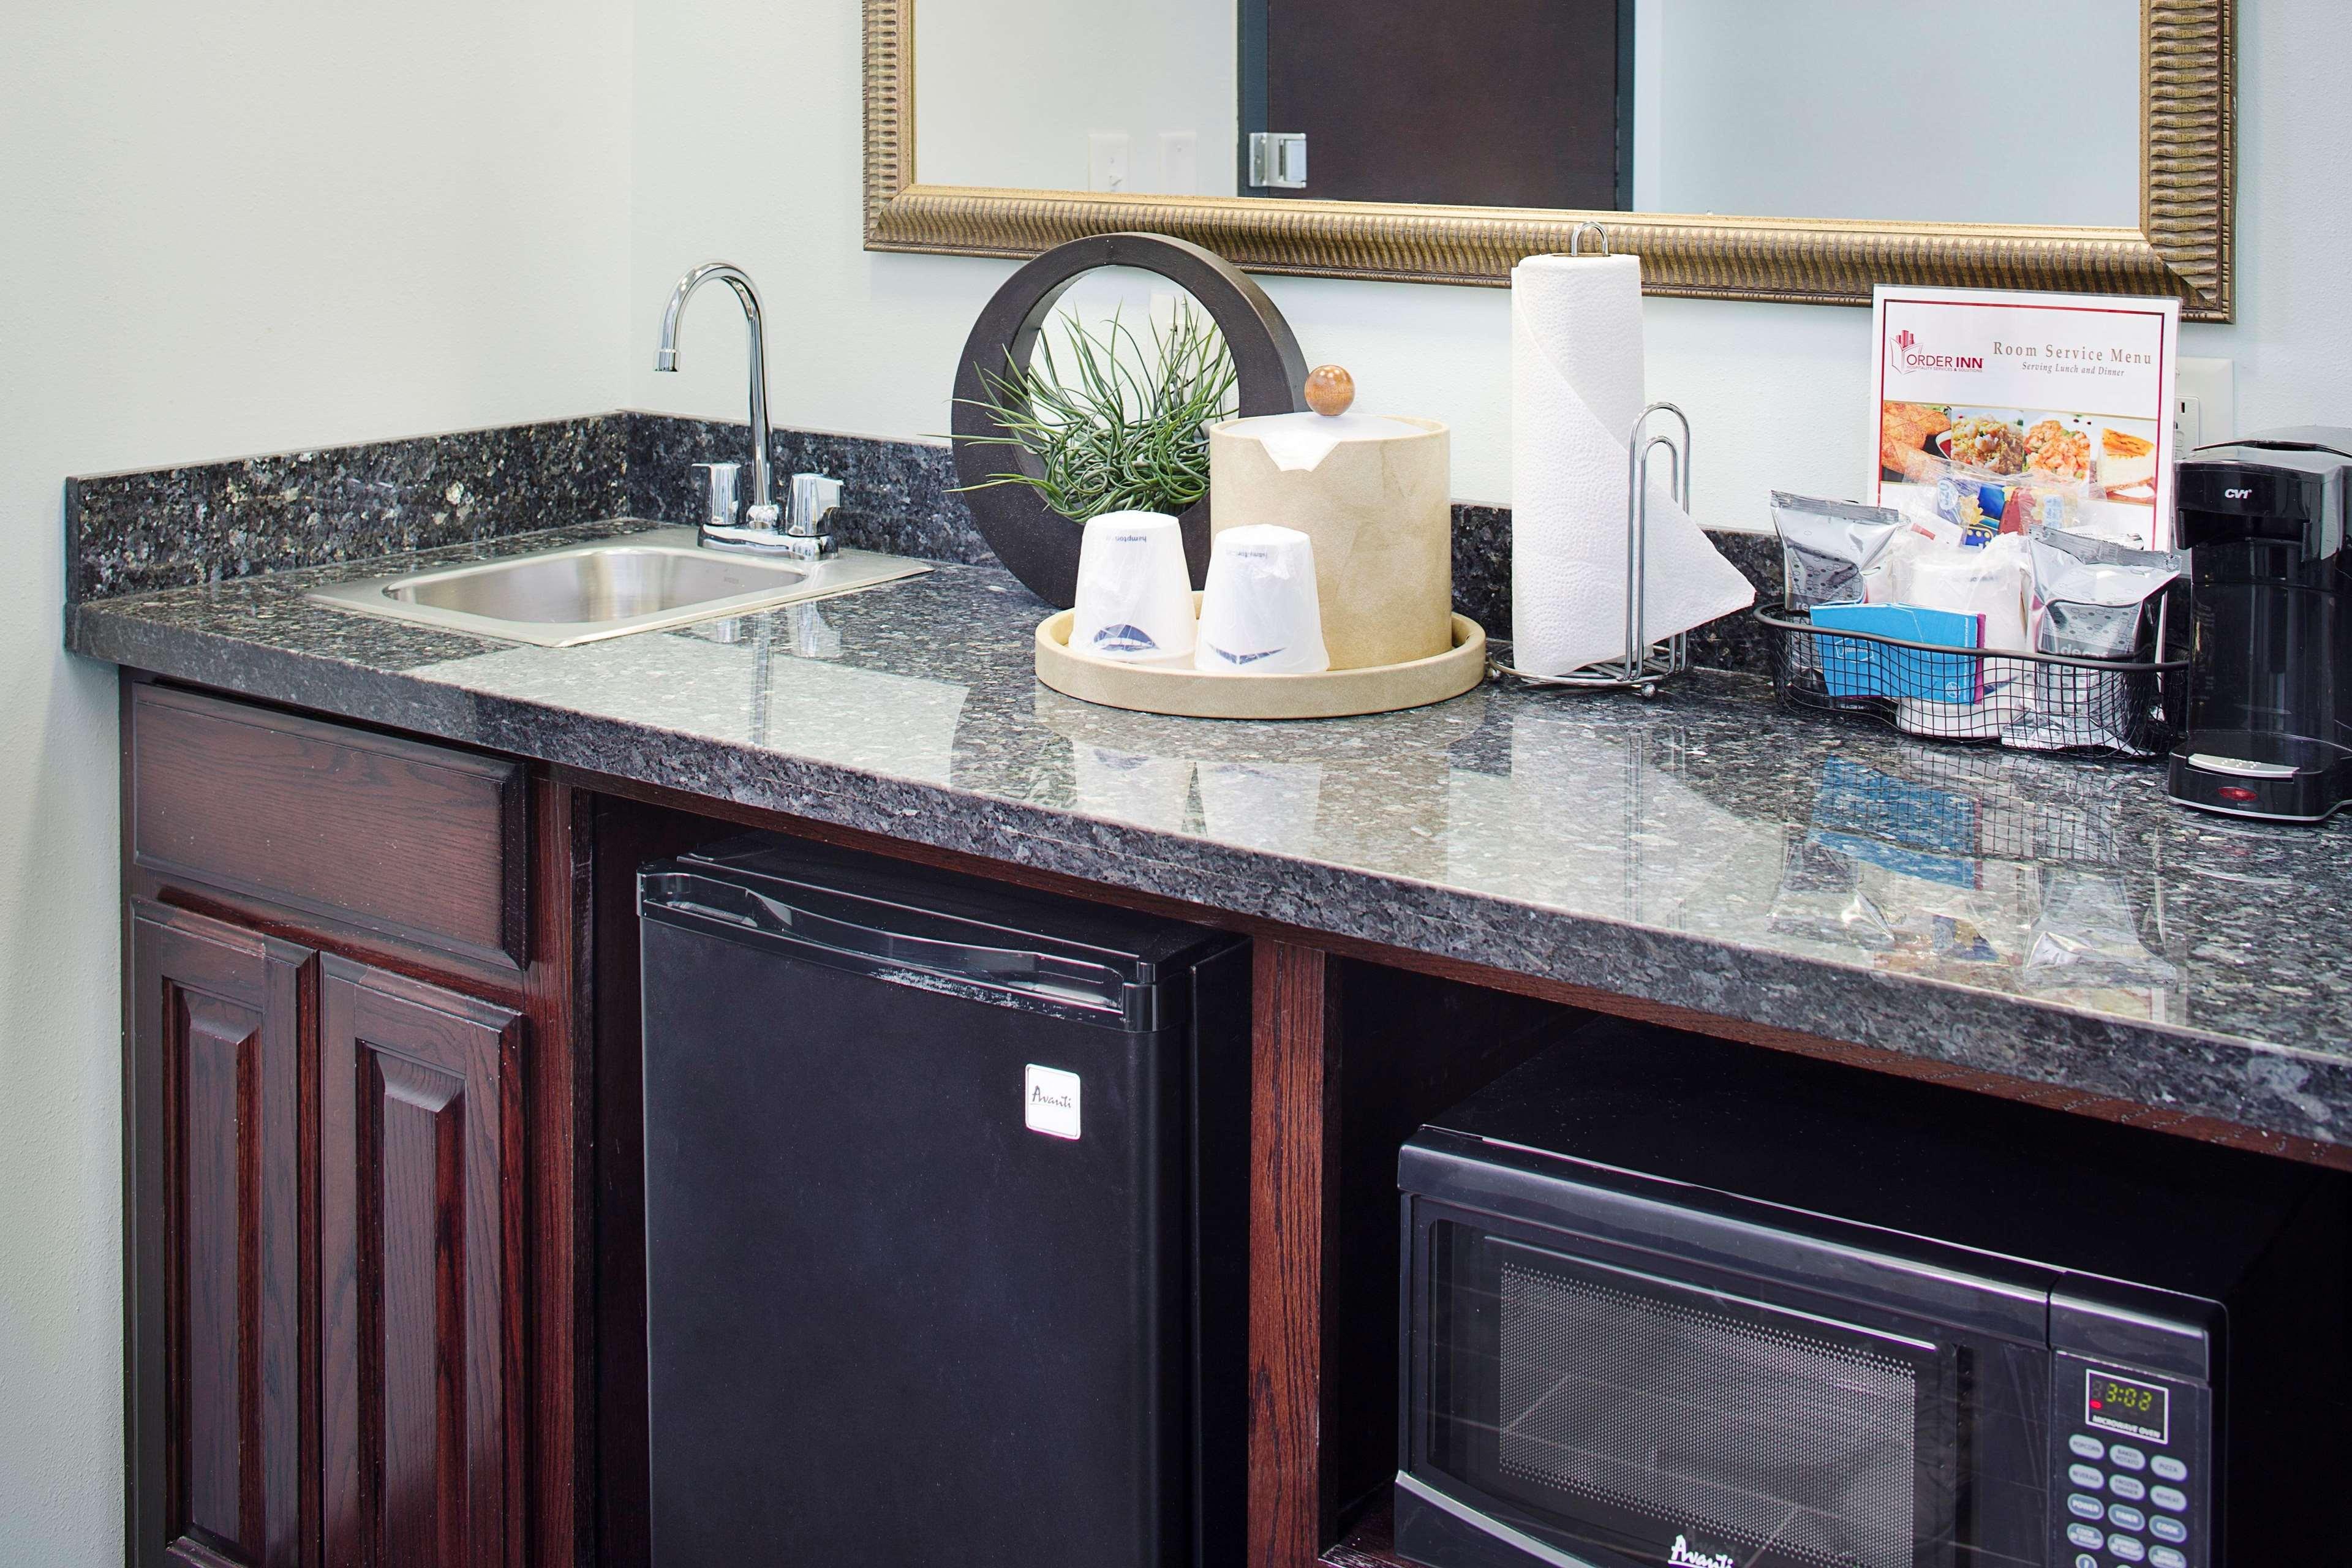 Hampton Inn & Suites Dallas/Lewisville-Vista Ridge Mall, TX image 40